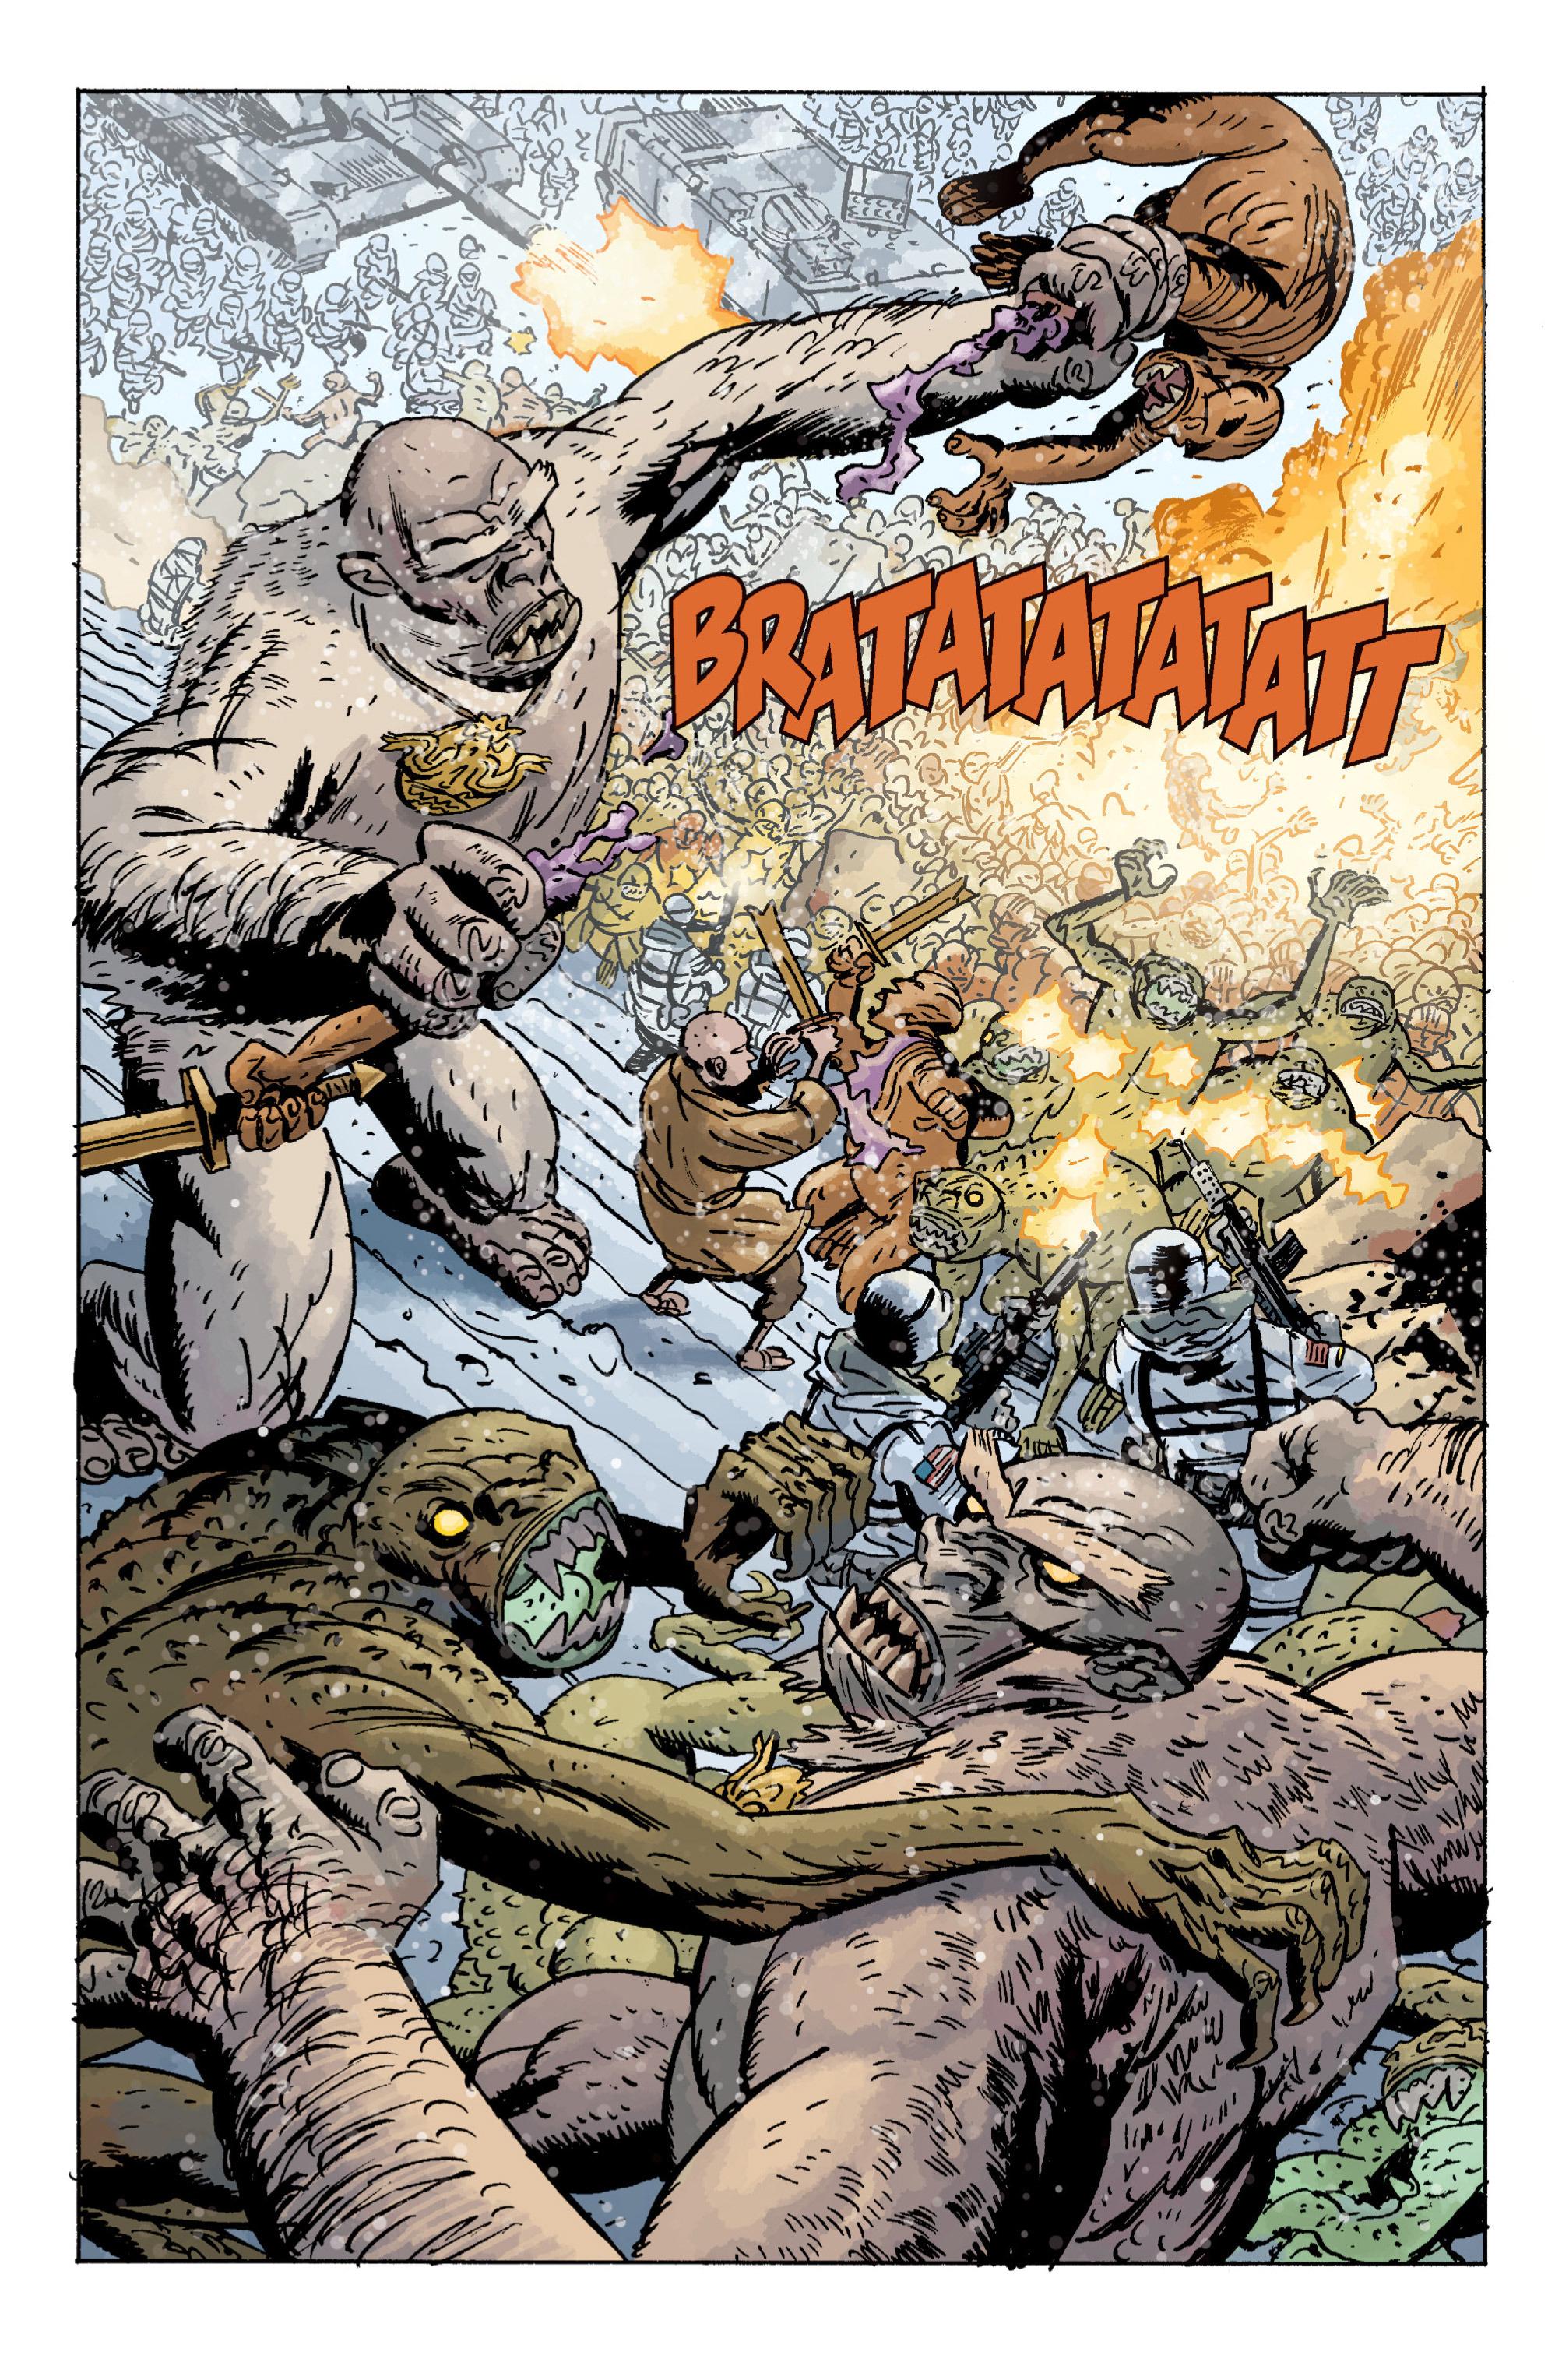 Read online B.P.R.D. (2003) comic -  Issue # TPB 11 - 65